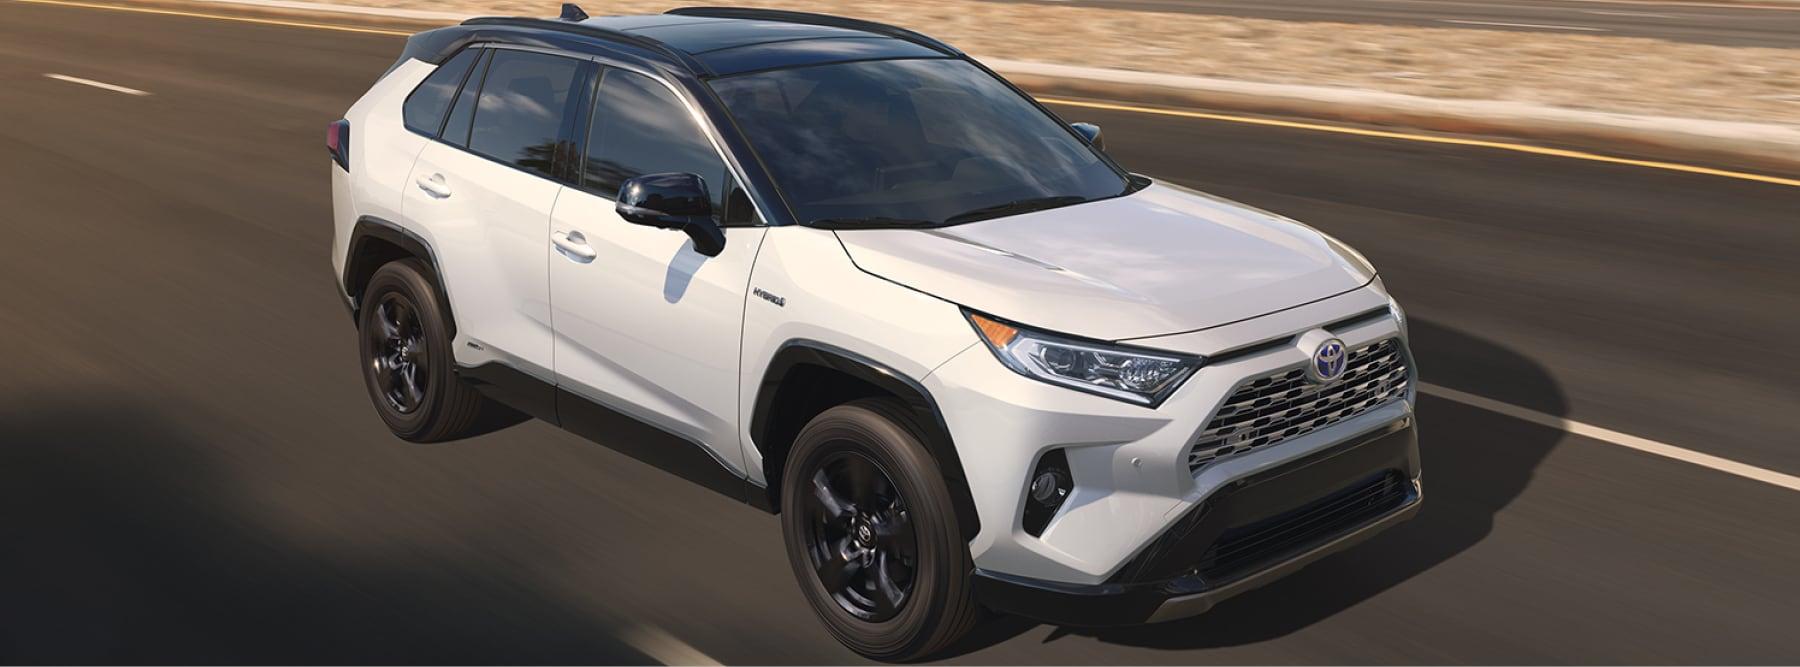 2019 Toyota Rav4 Vehicle Review Destination Toyota